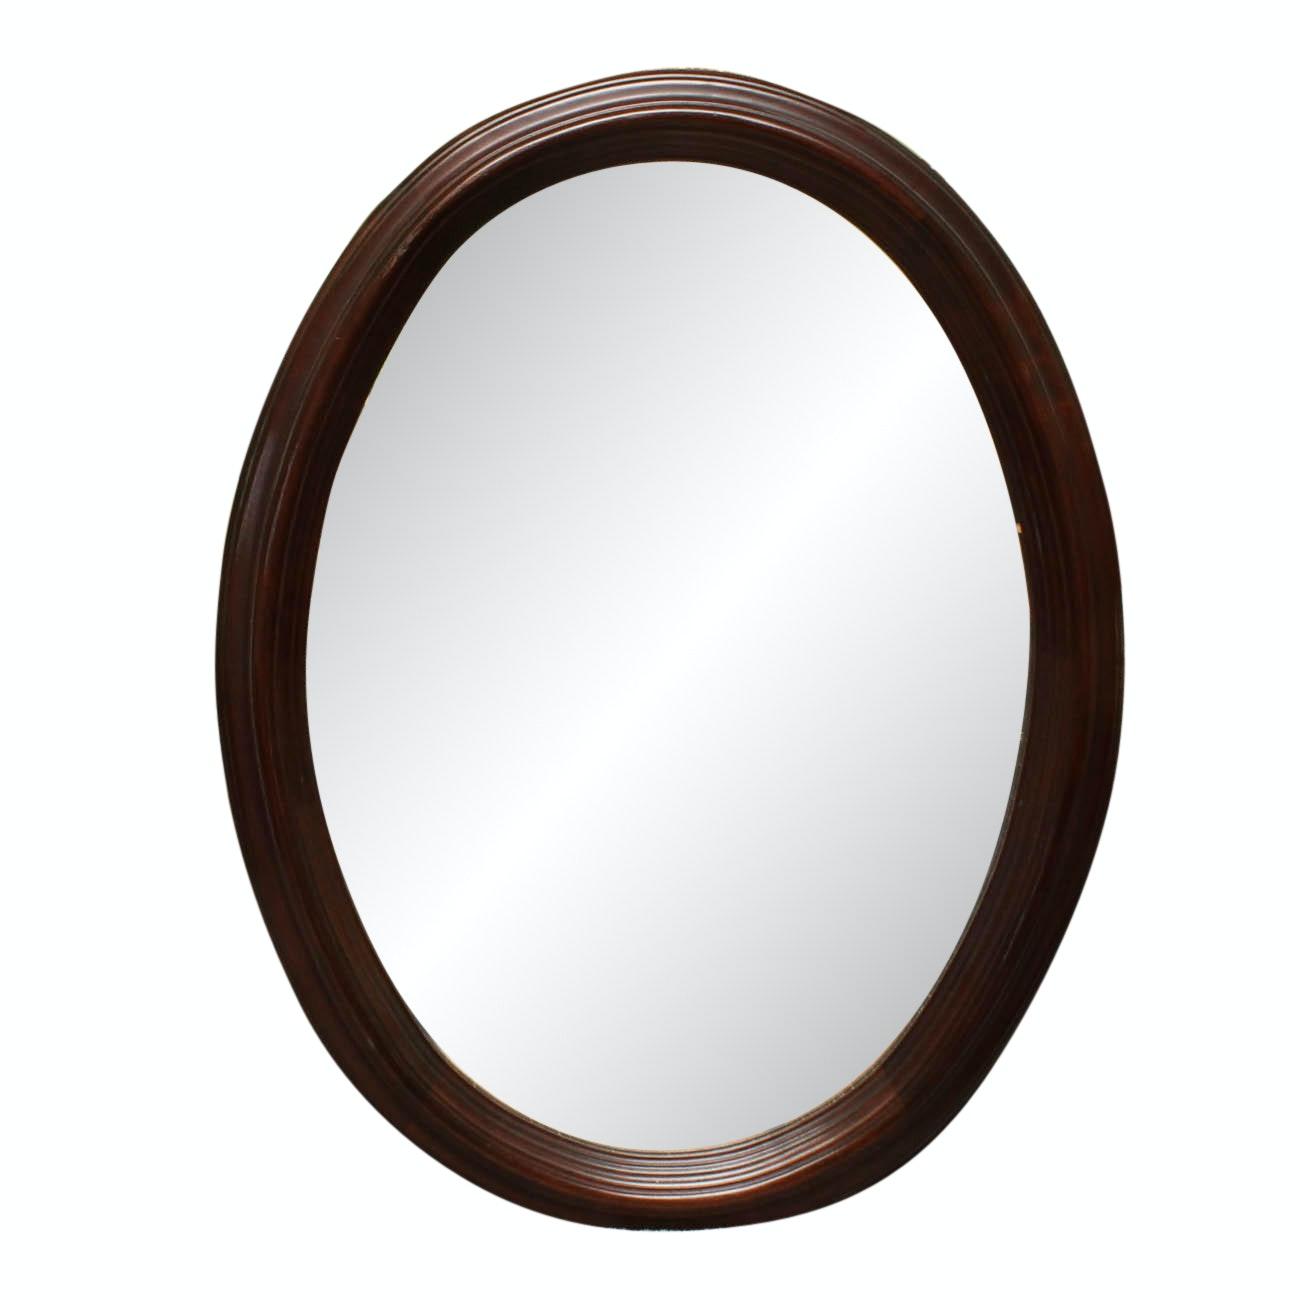 Vintage Walnut Oval Beveled Wall Mirror